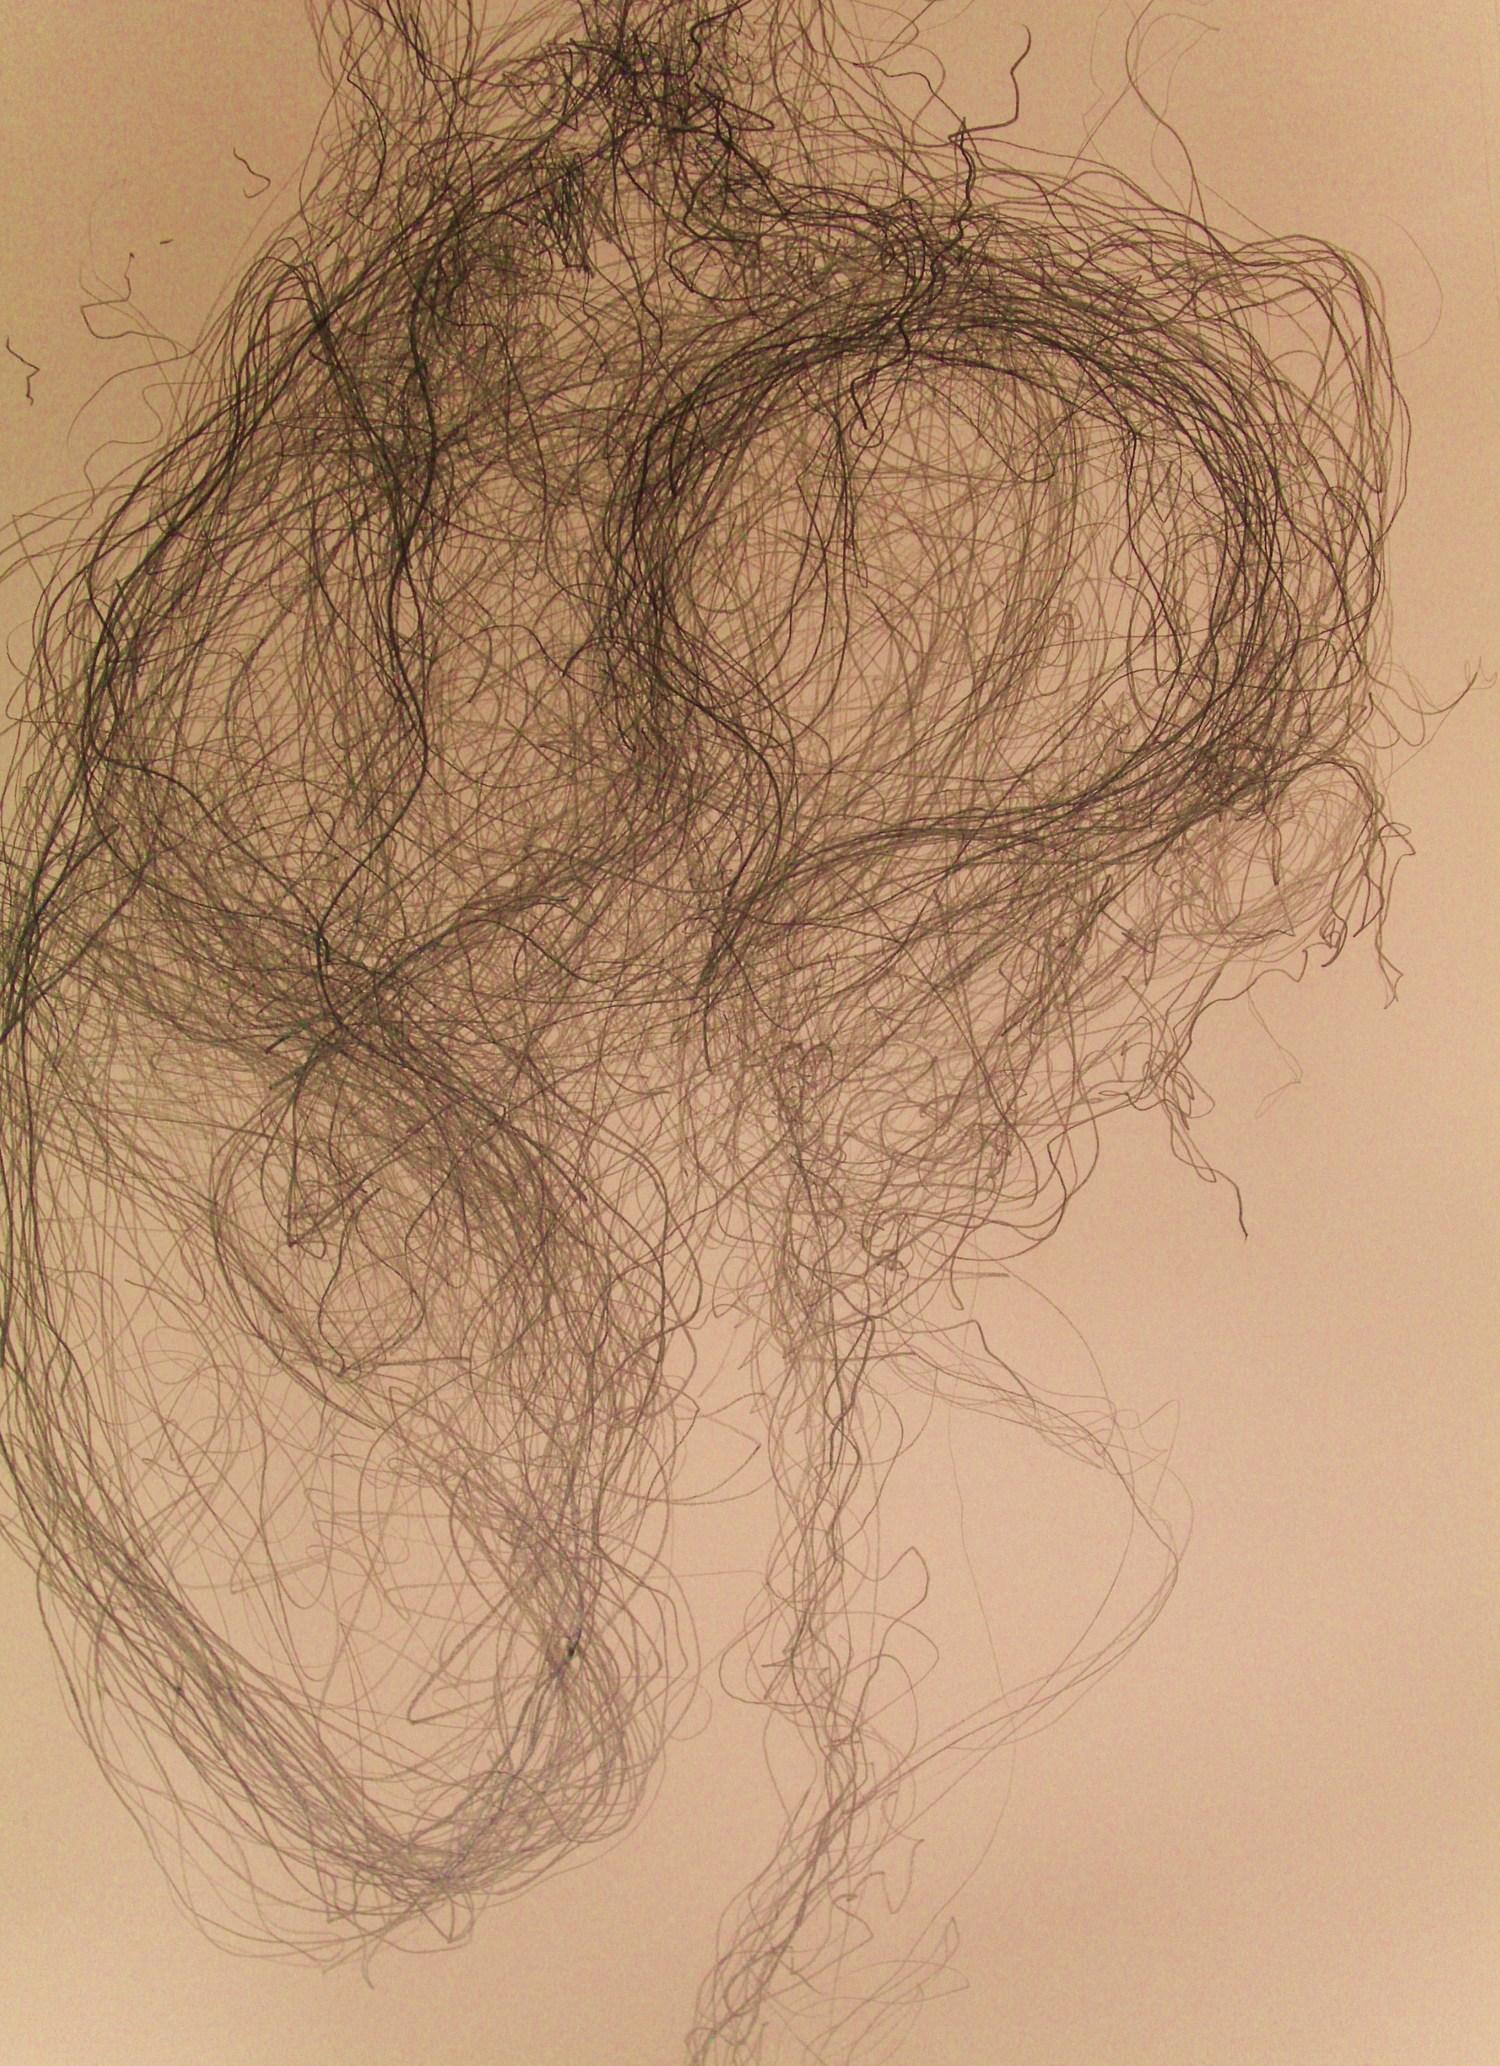 Sheeps wool Beddgellert (2013) - detail